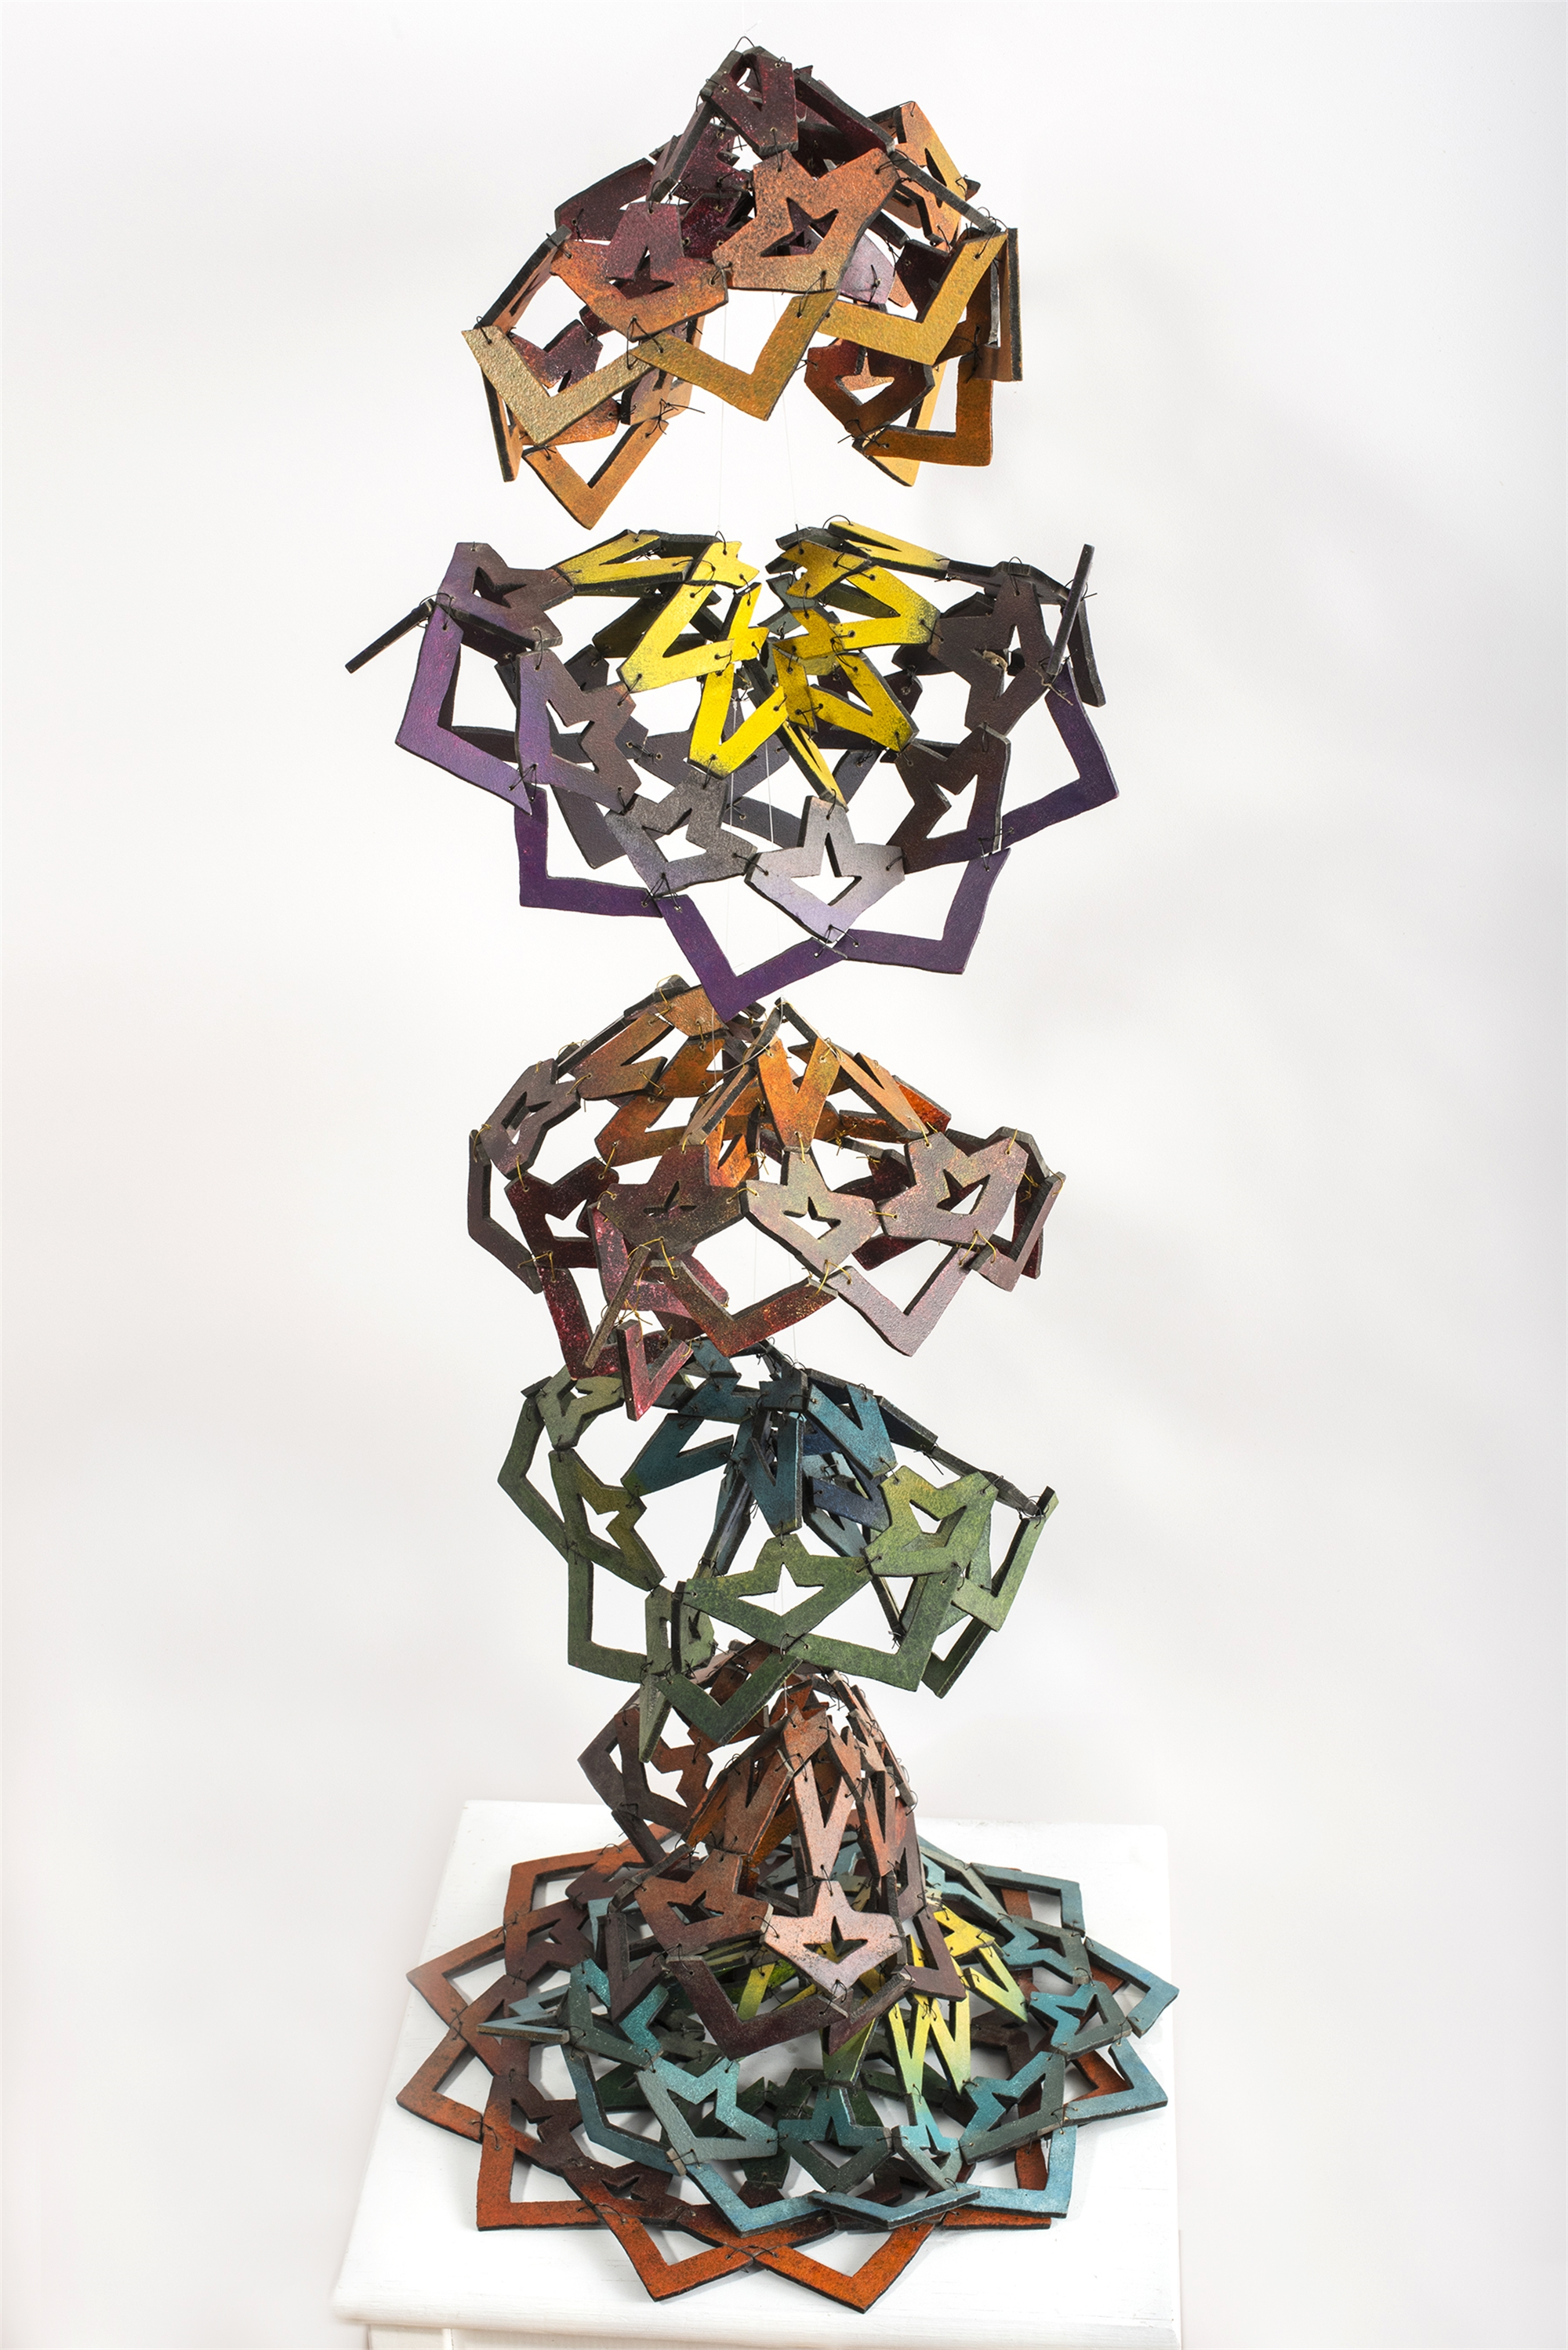 Collapsed Geometry by June Sekiguchi